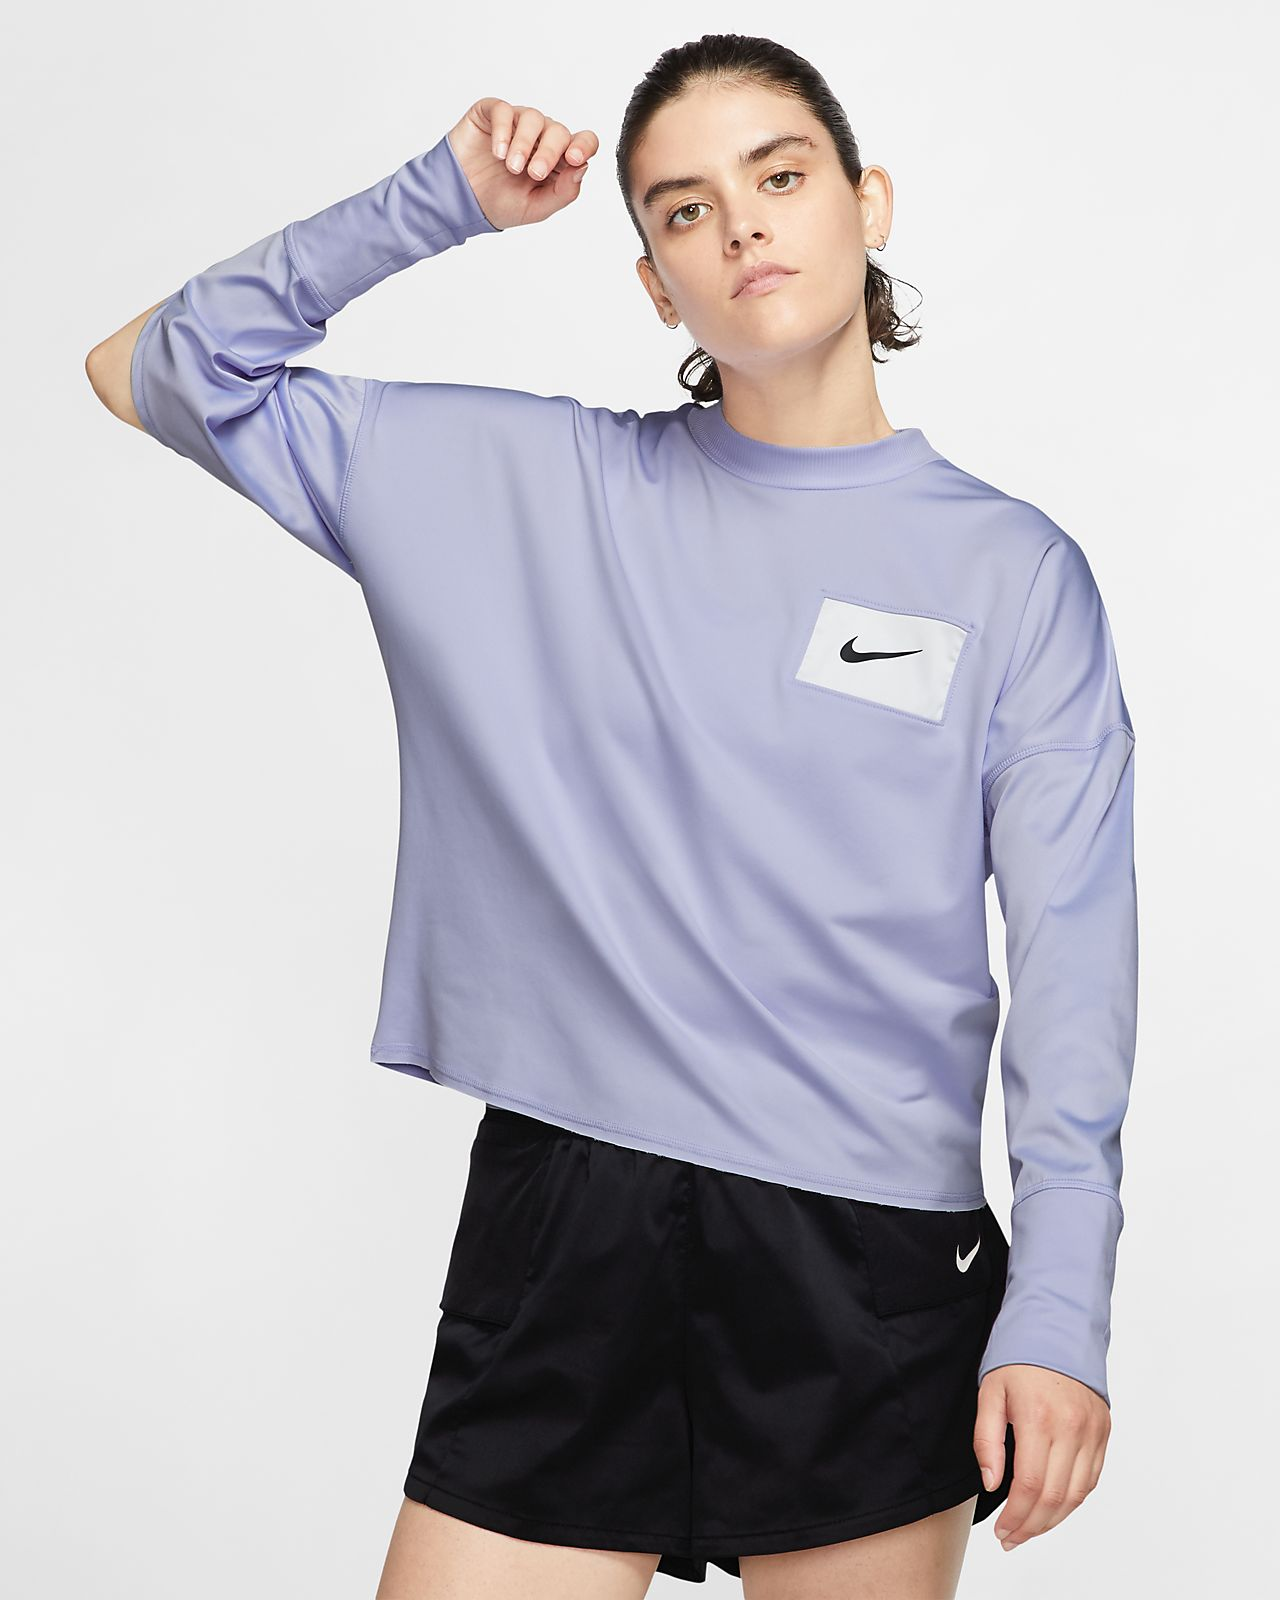 abbigliamento nike running opinioni, Nike felpa girocollo